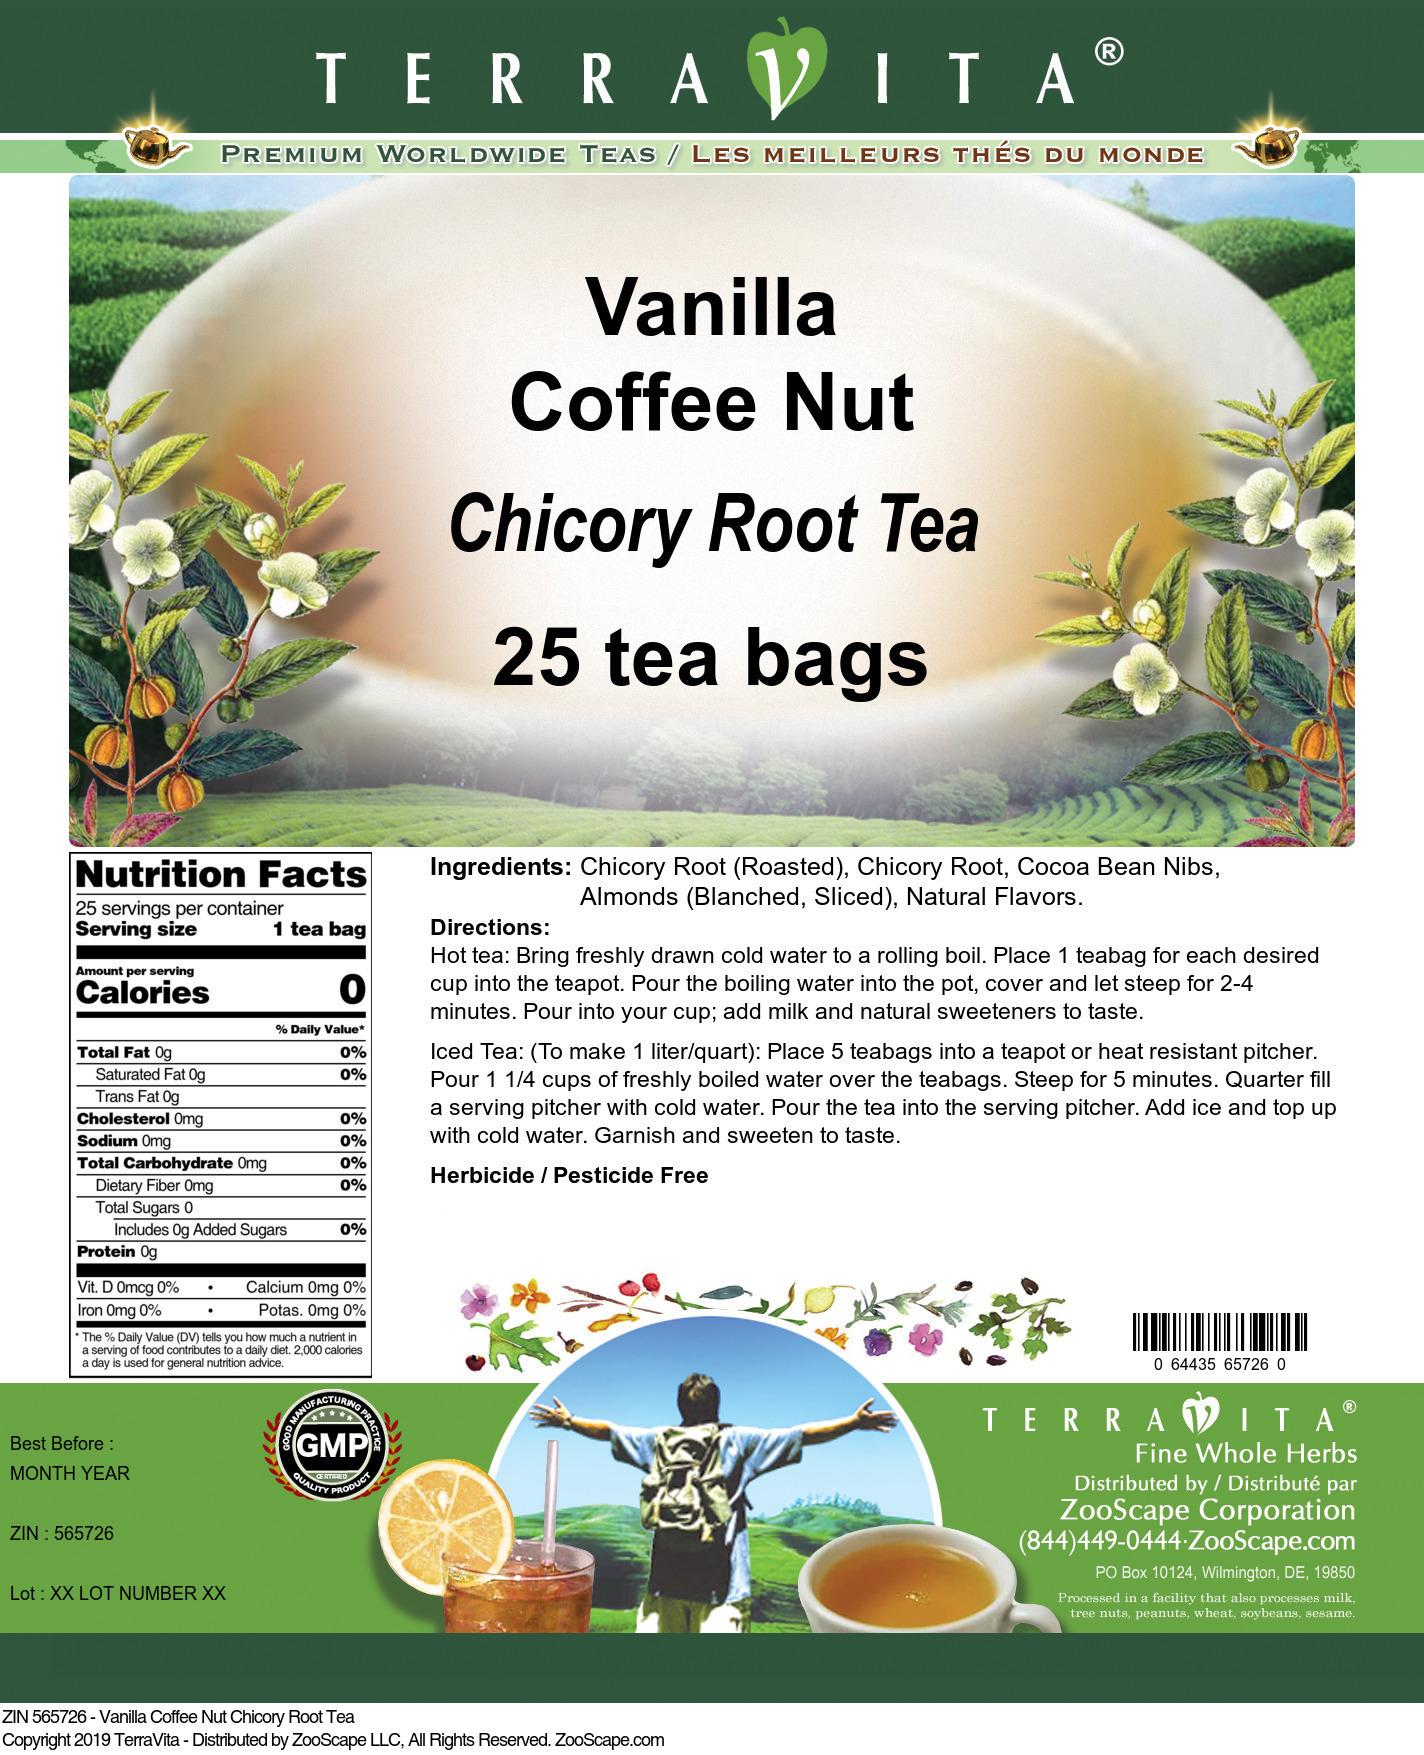 Vanilla Coffee Nut Chicory Root Tea